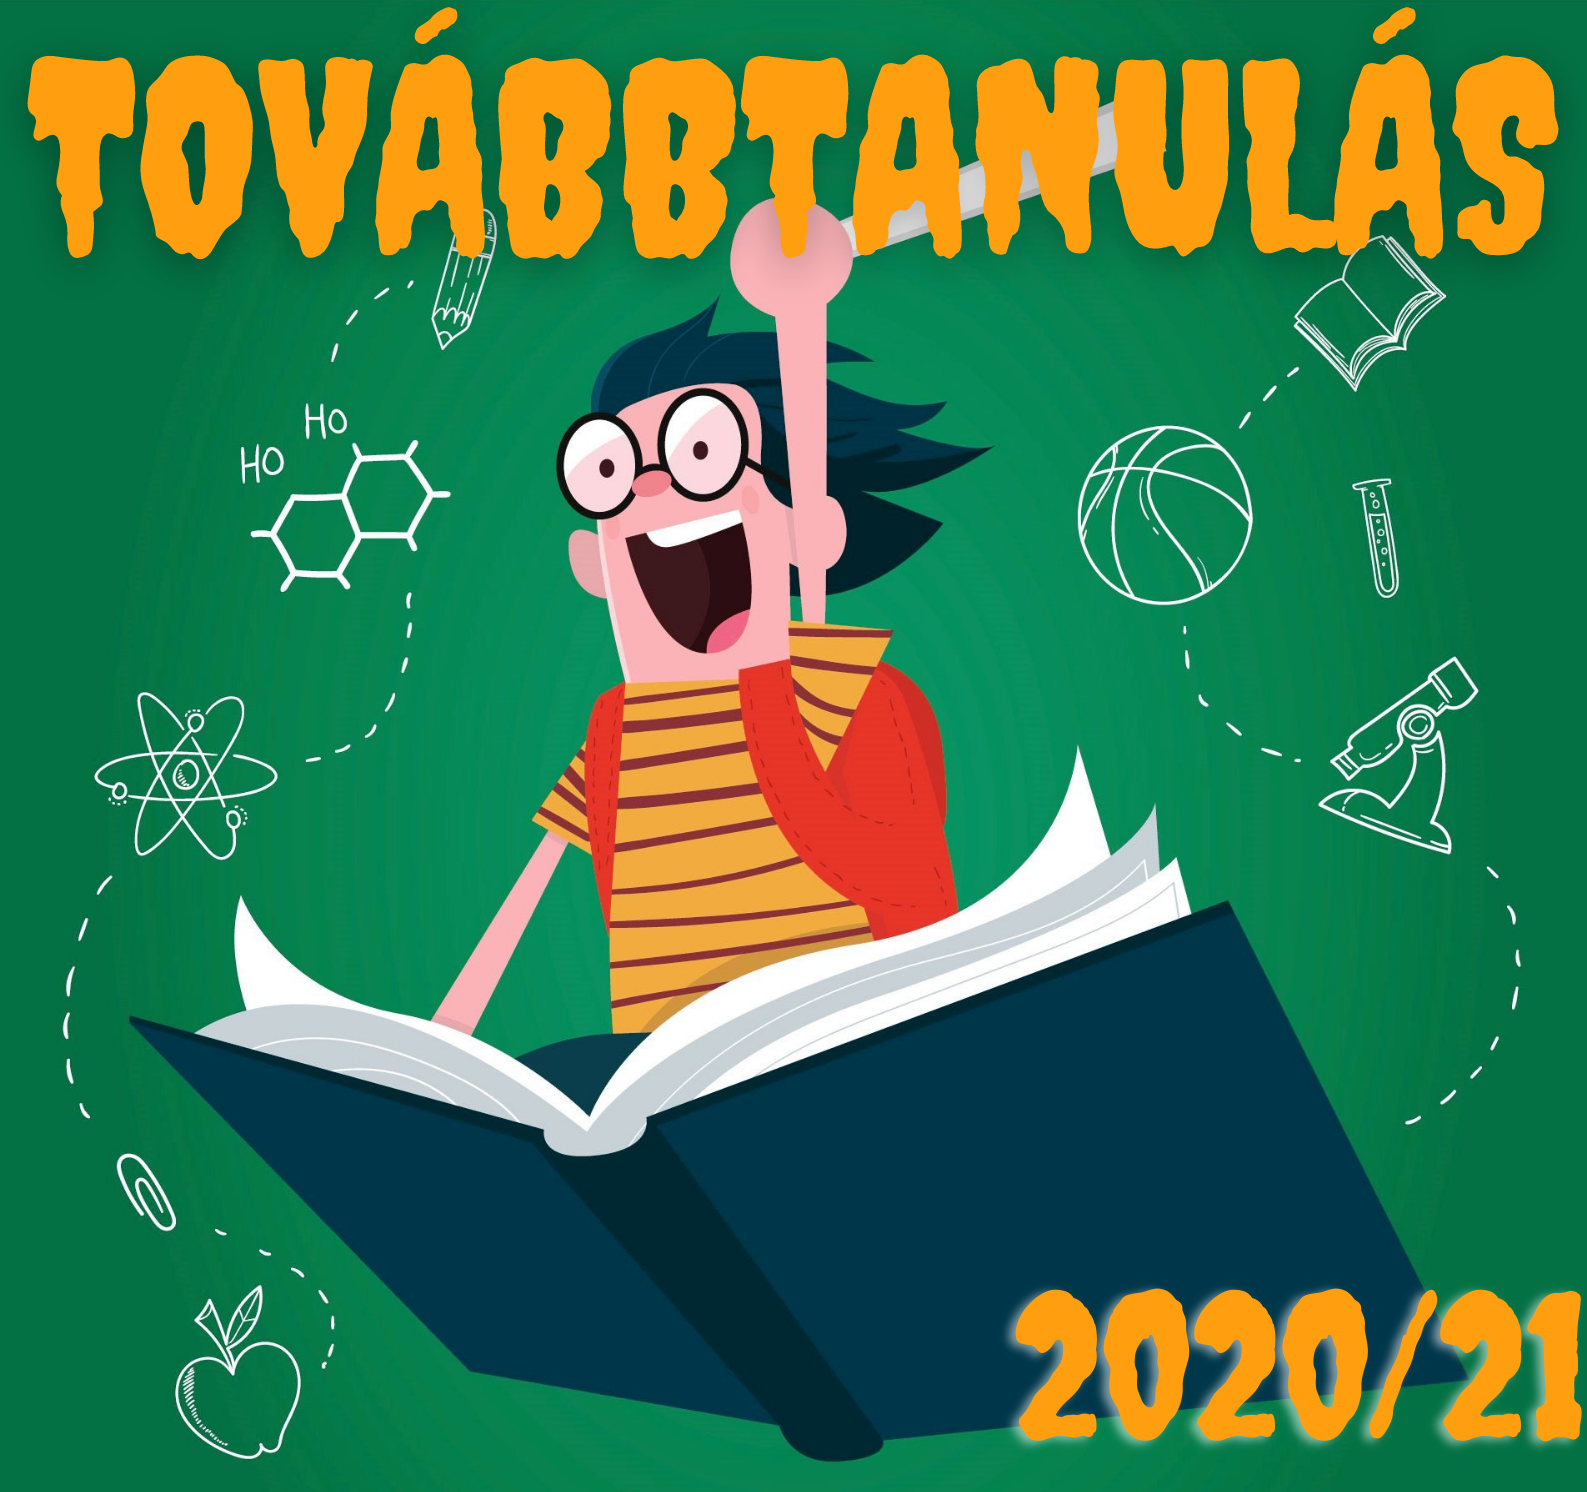 Továbbtanulás 2020/21